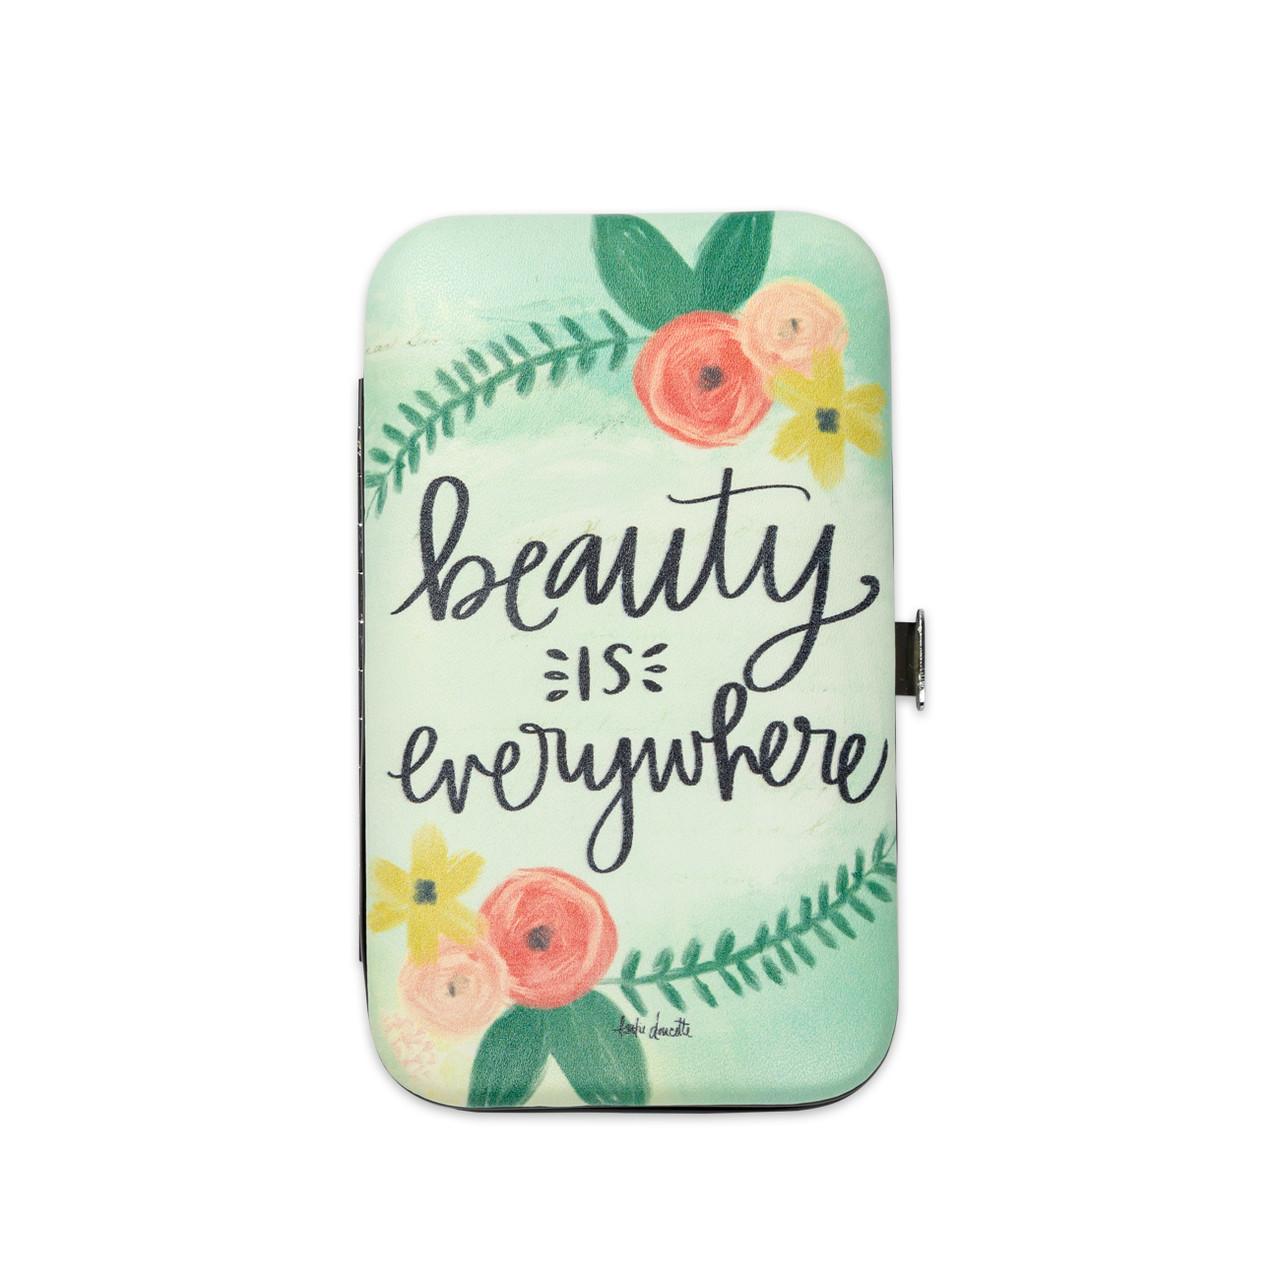 manicure set gift inspirational